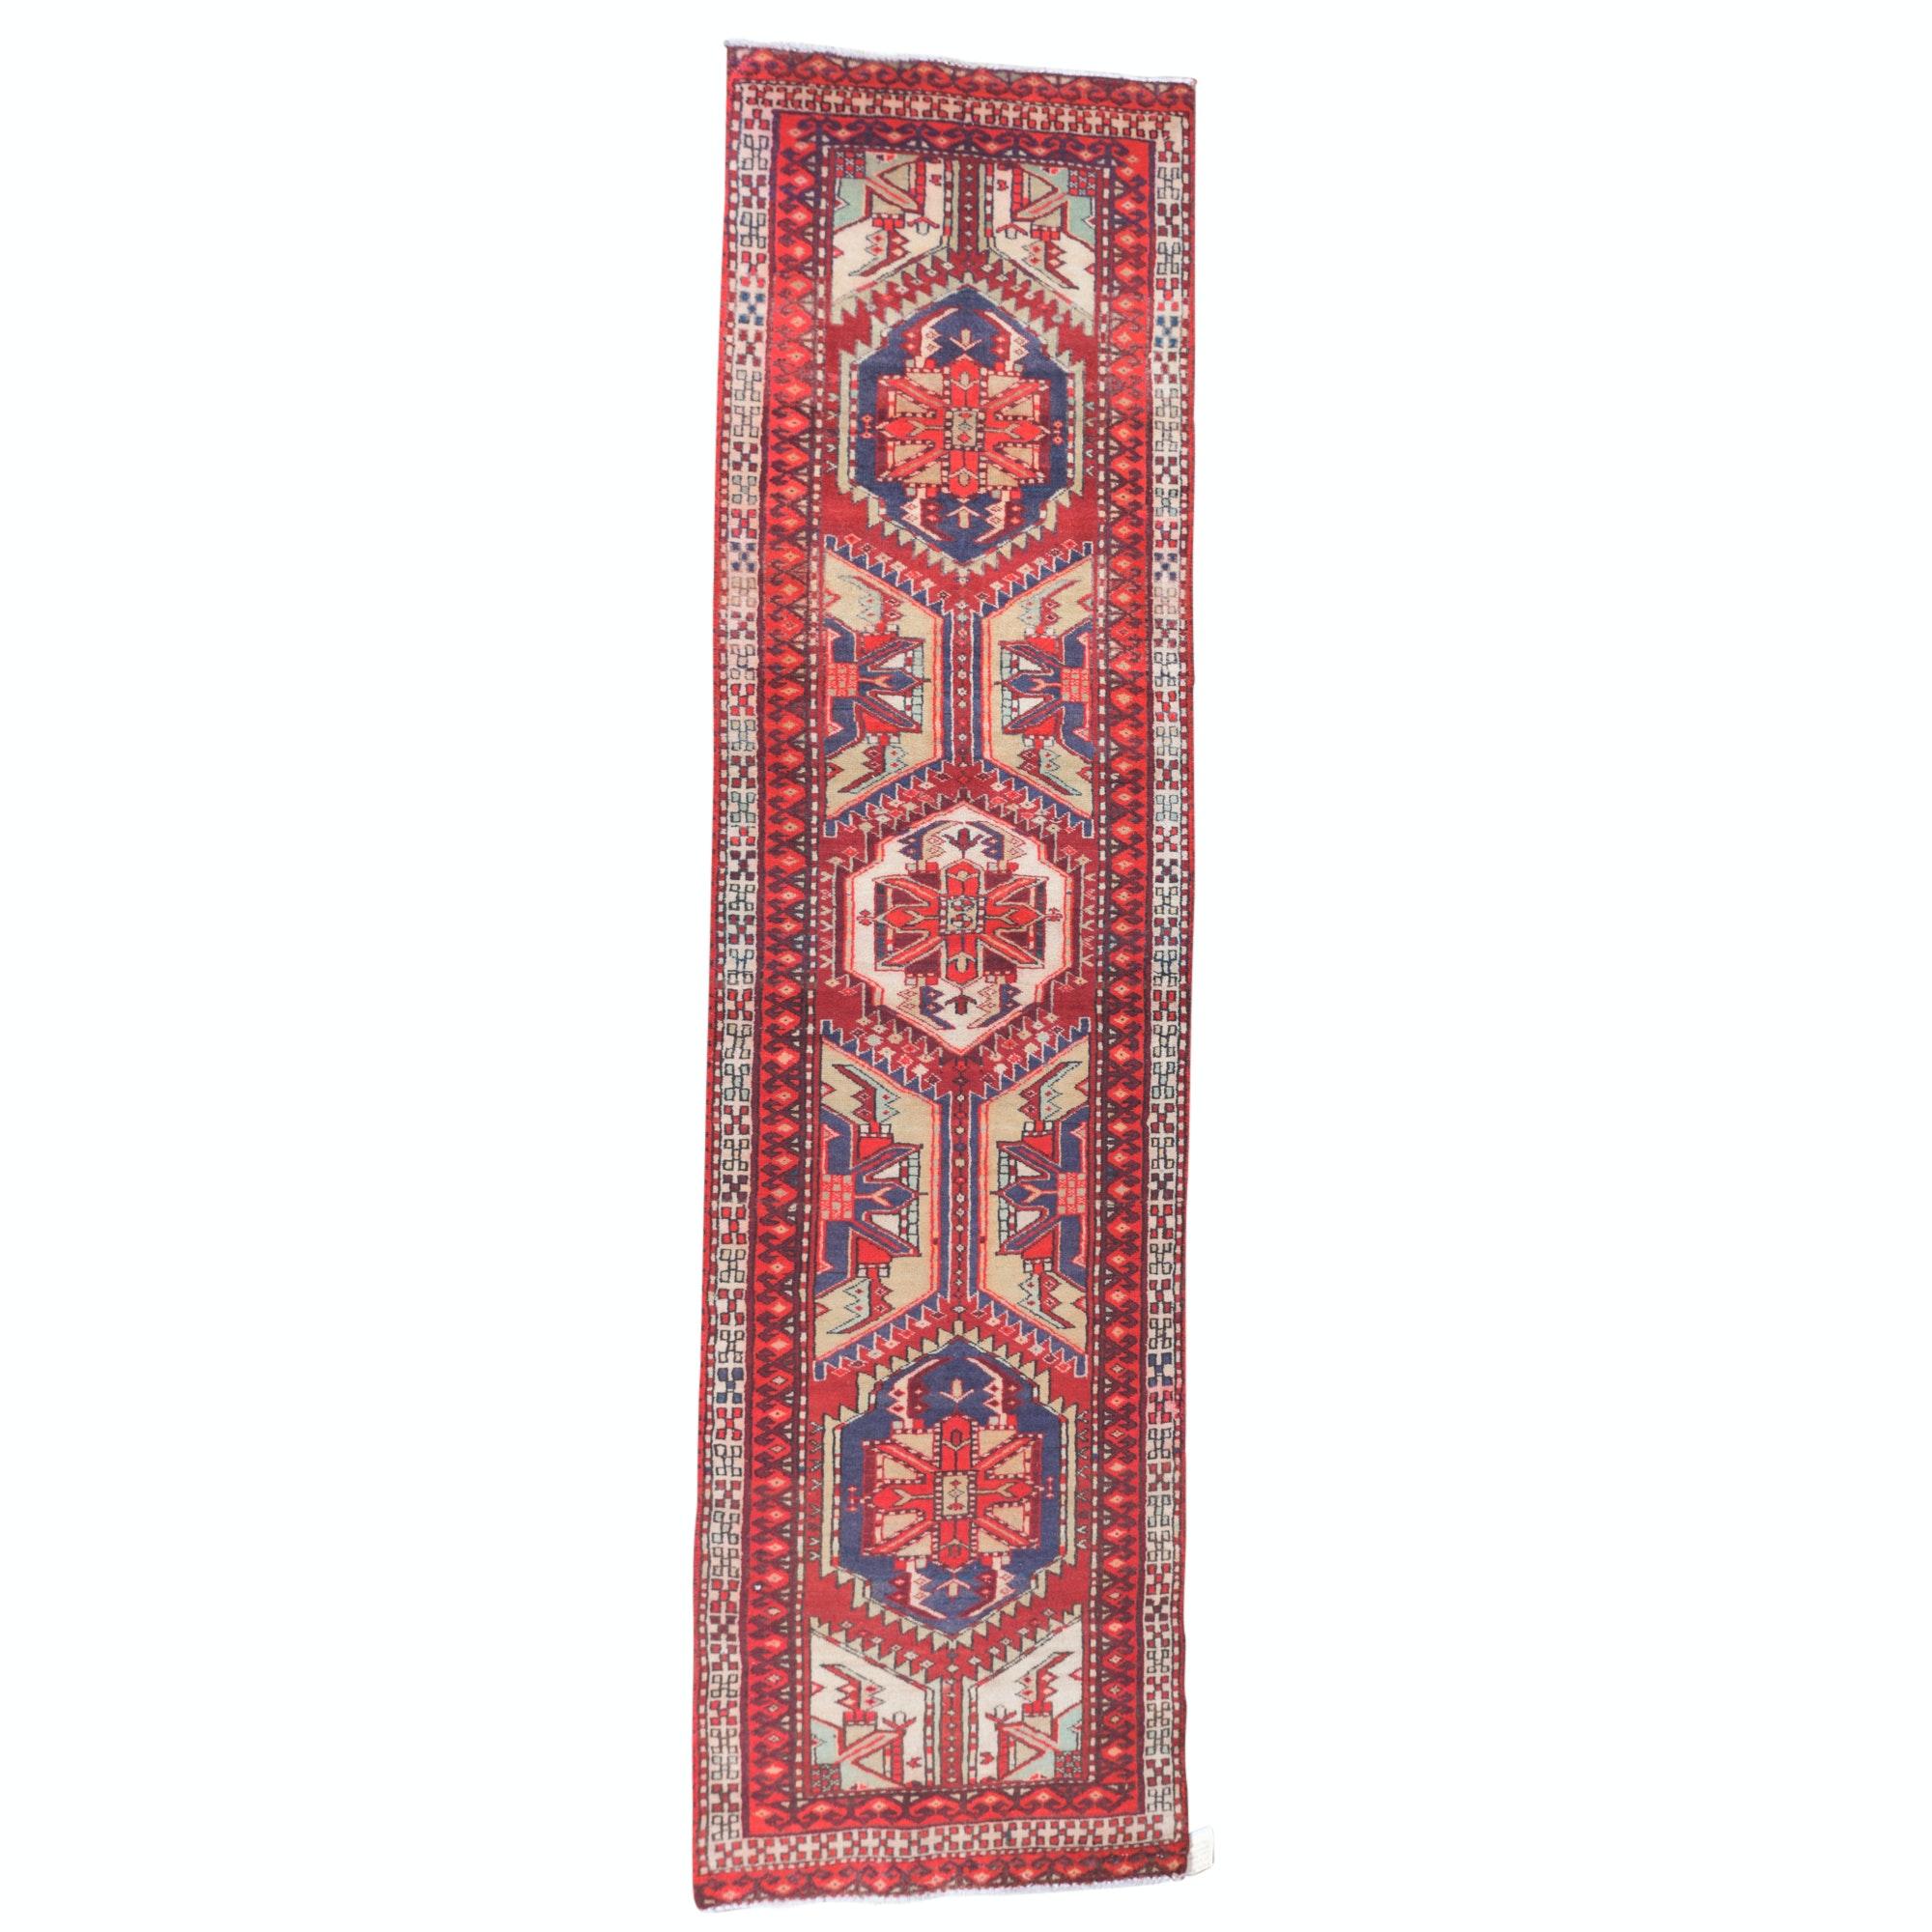 Hand-Knotted Persian Tabriz Wool Carpet Runner